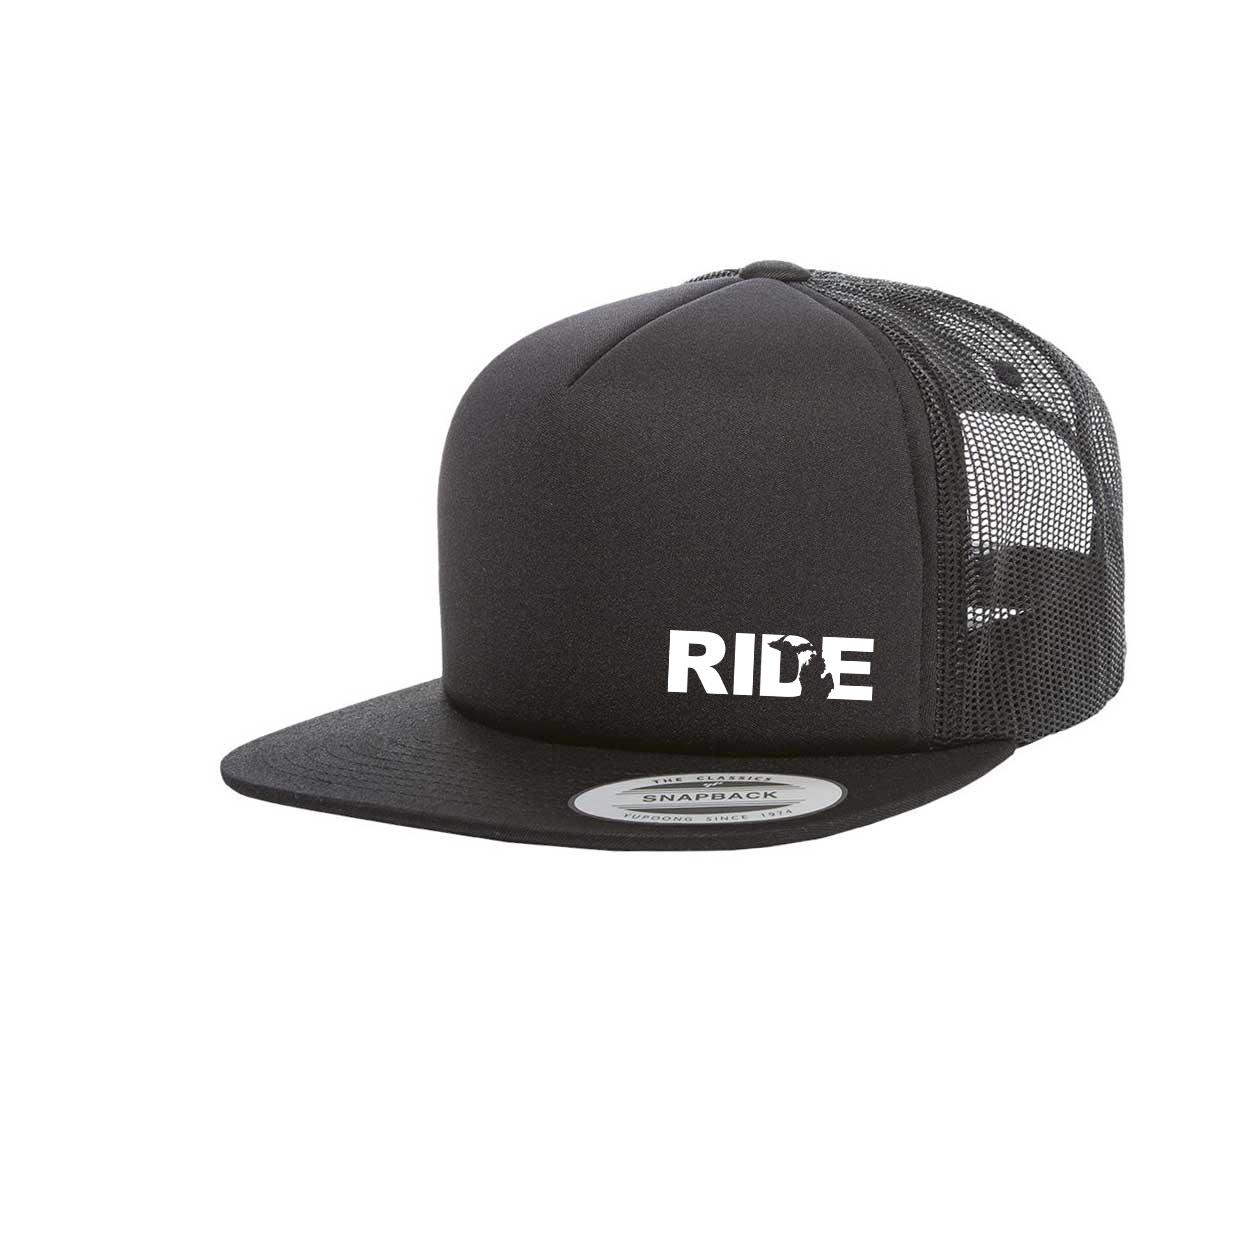 Ride Michigan Night Out Premium Foam Flat Brim Snapback Hat Black (White Logo)